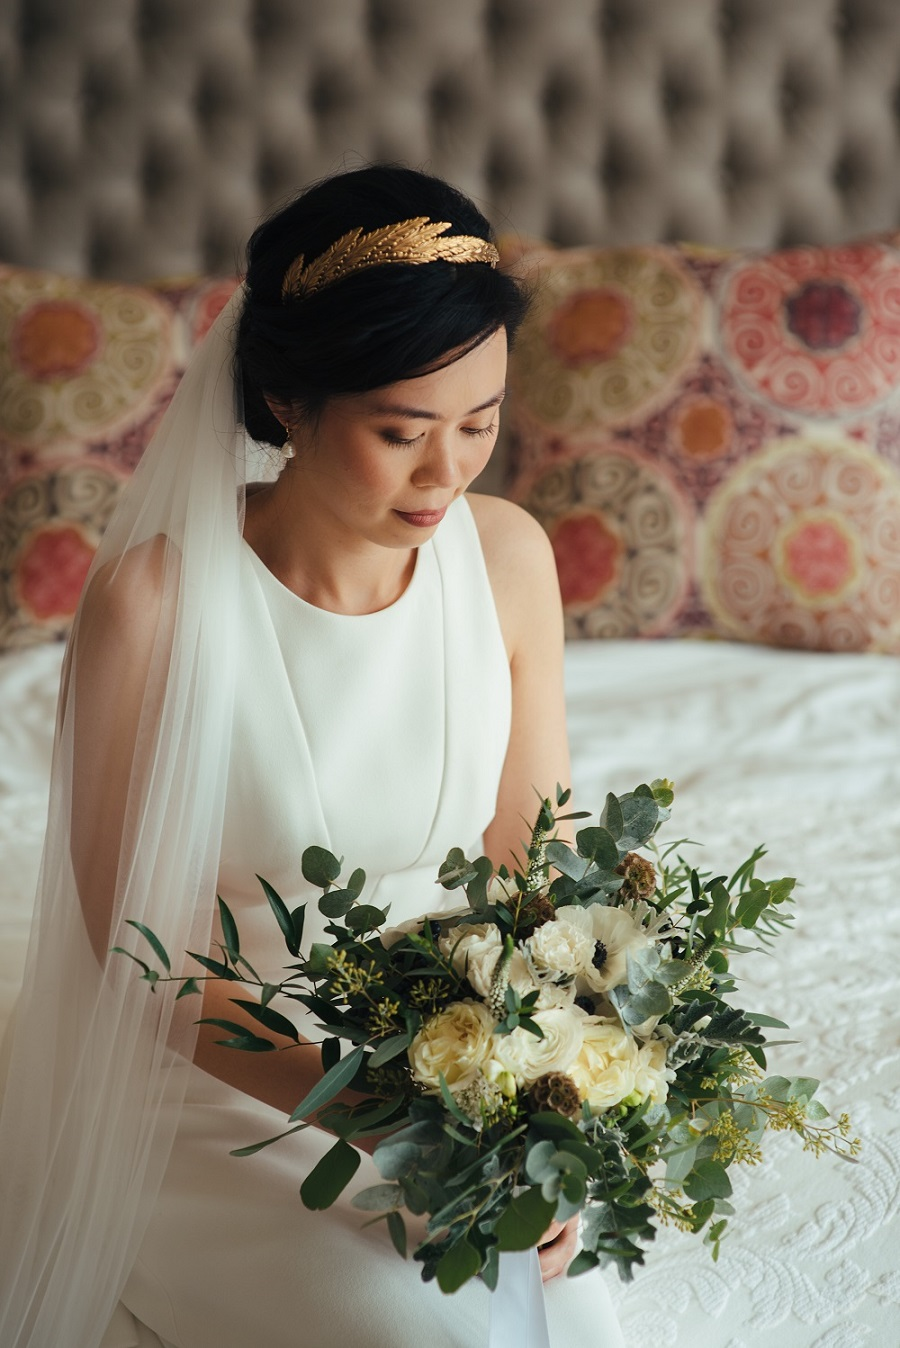 Matt & Liz from Elizabeth Weddings, photo by Cat Beardsley Photography on English Wedding Blog (20)